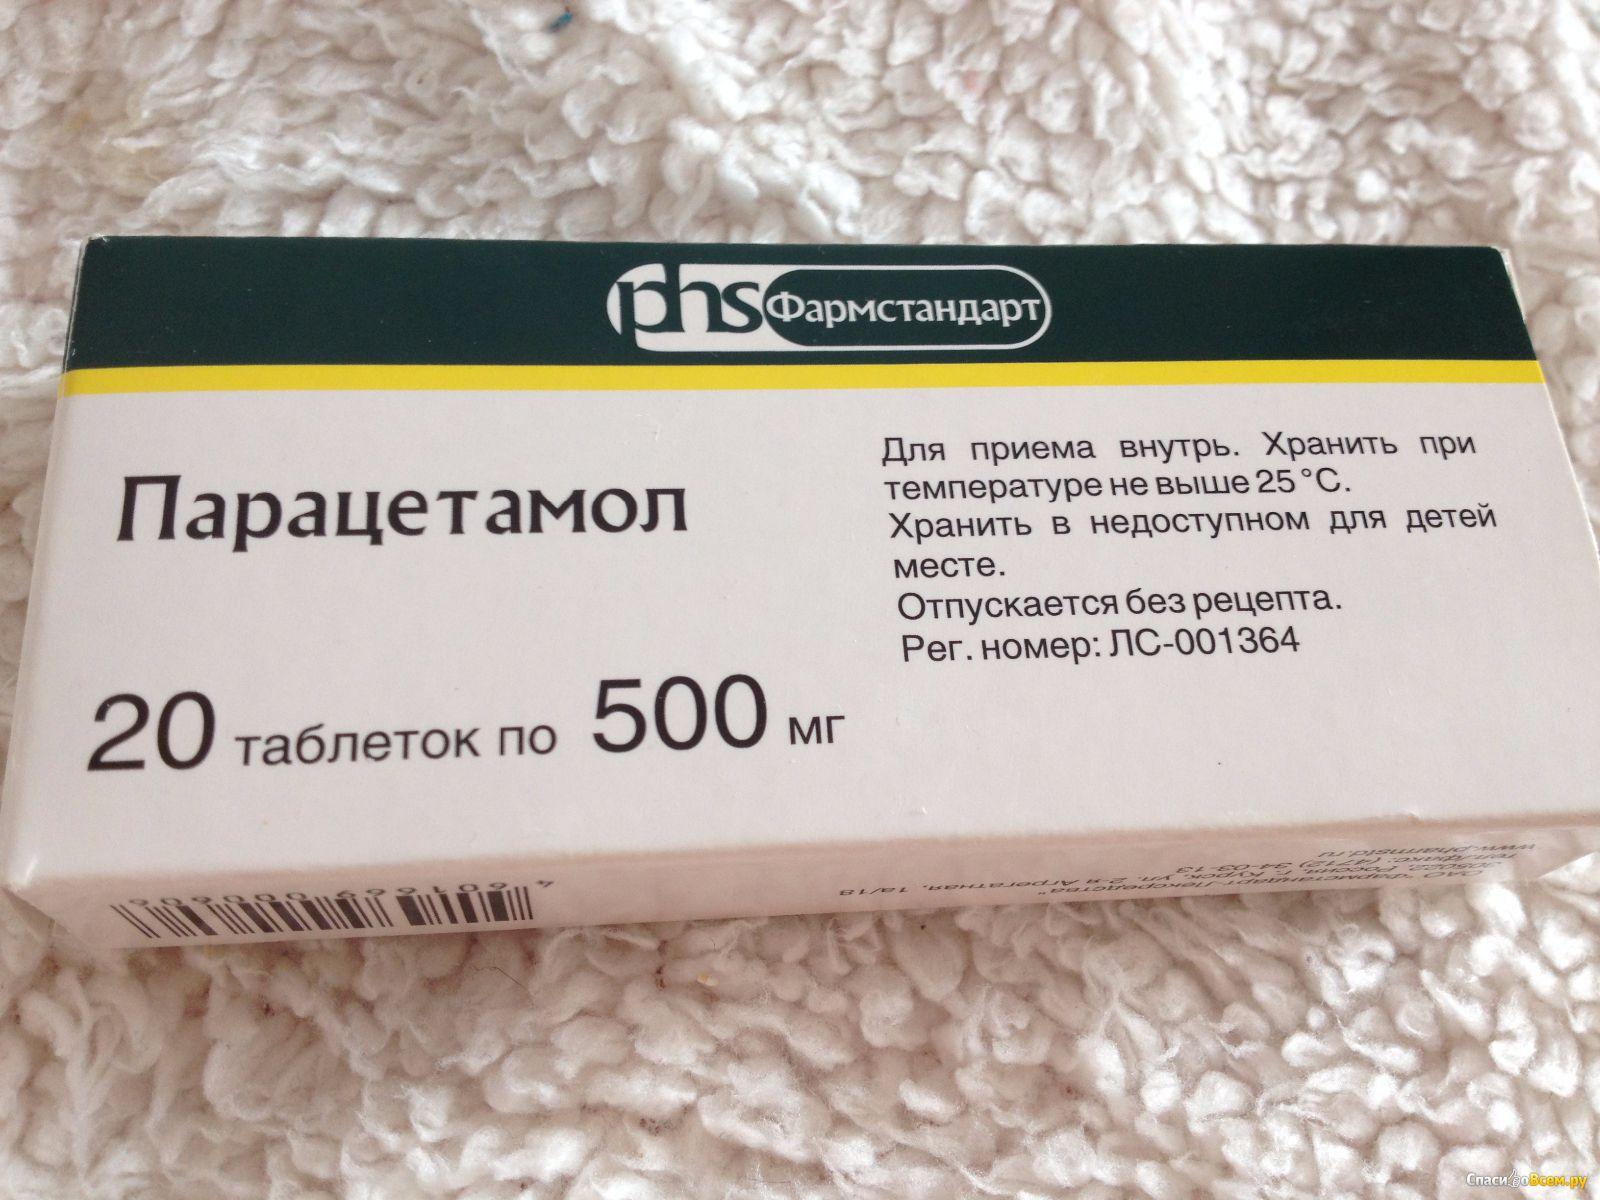 Парацетамол инструкция. 2047107.ru